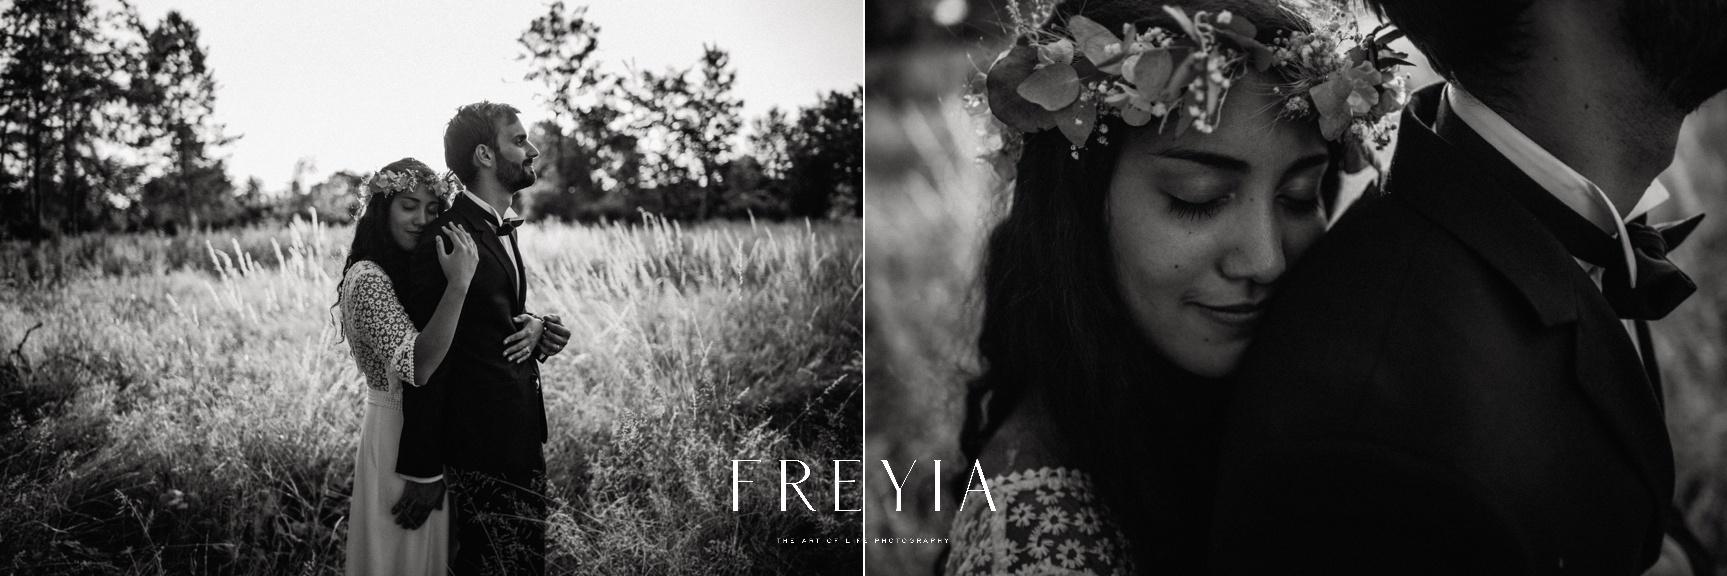 R + T |  mariage reportage alternatif moody intime minimaliste vintage naturel boho boheme |  PHOTOGRAPHE mariage PARIS france destination  | FREYIA photography_-297.jpg